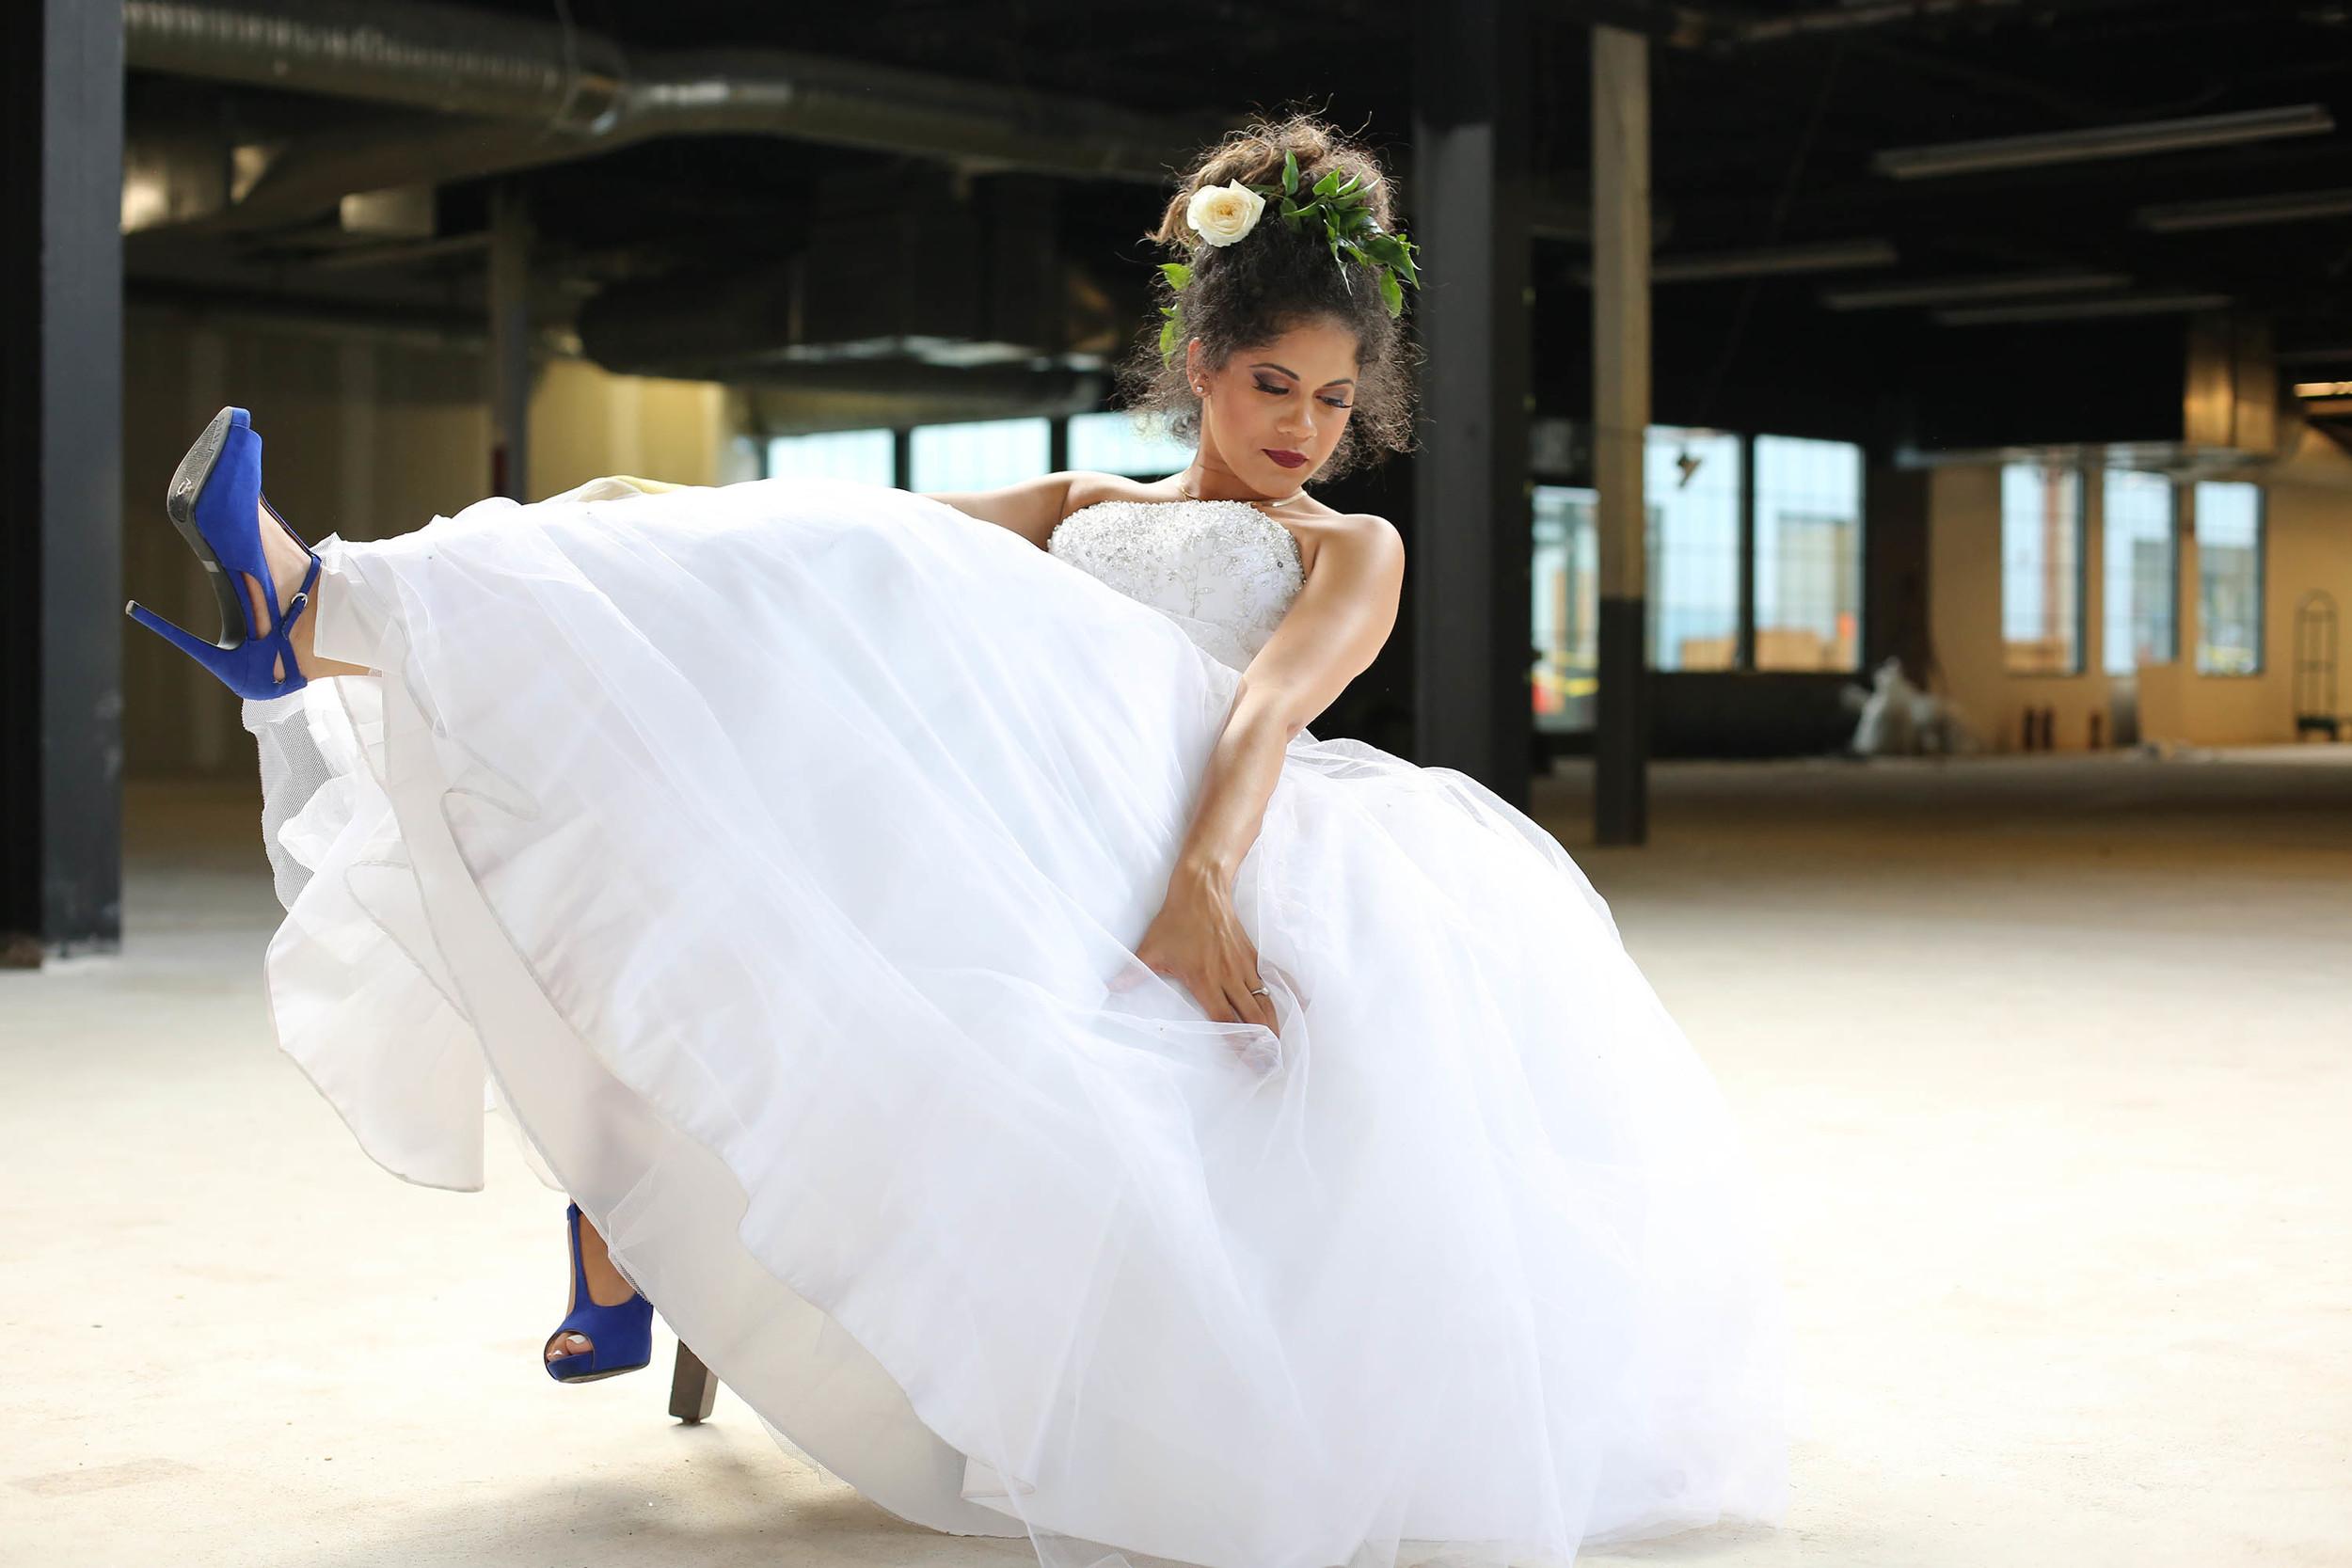 loving all this dress